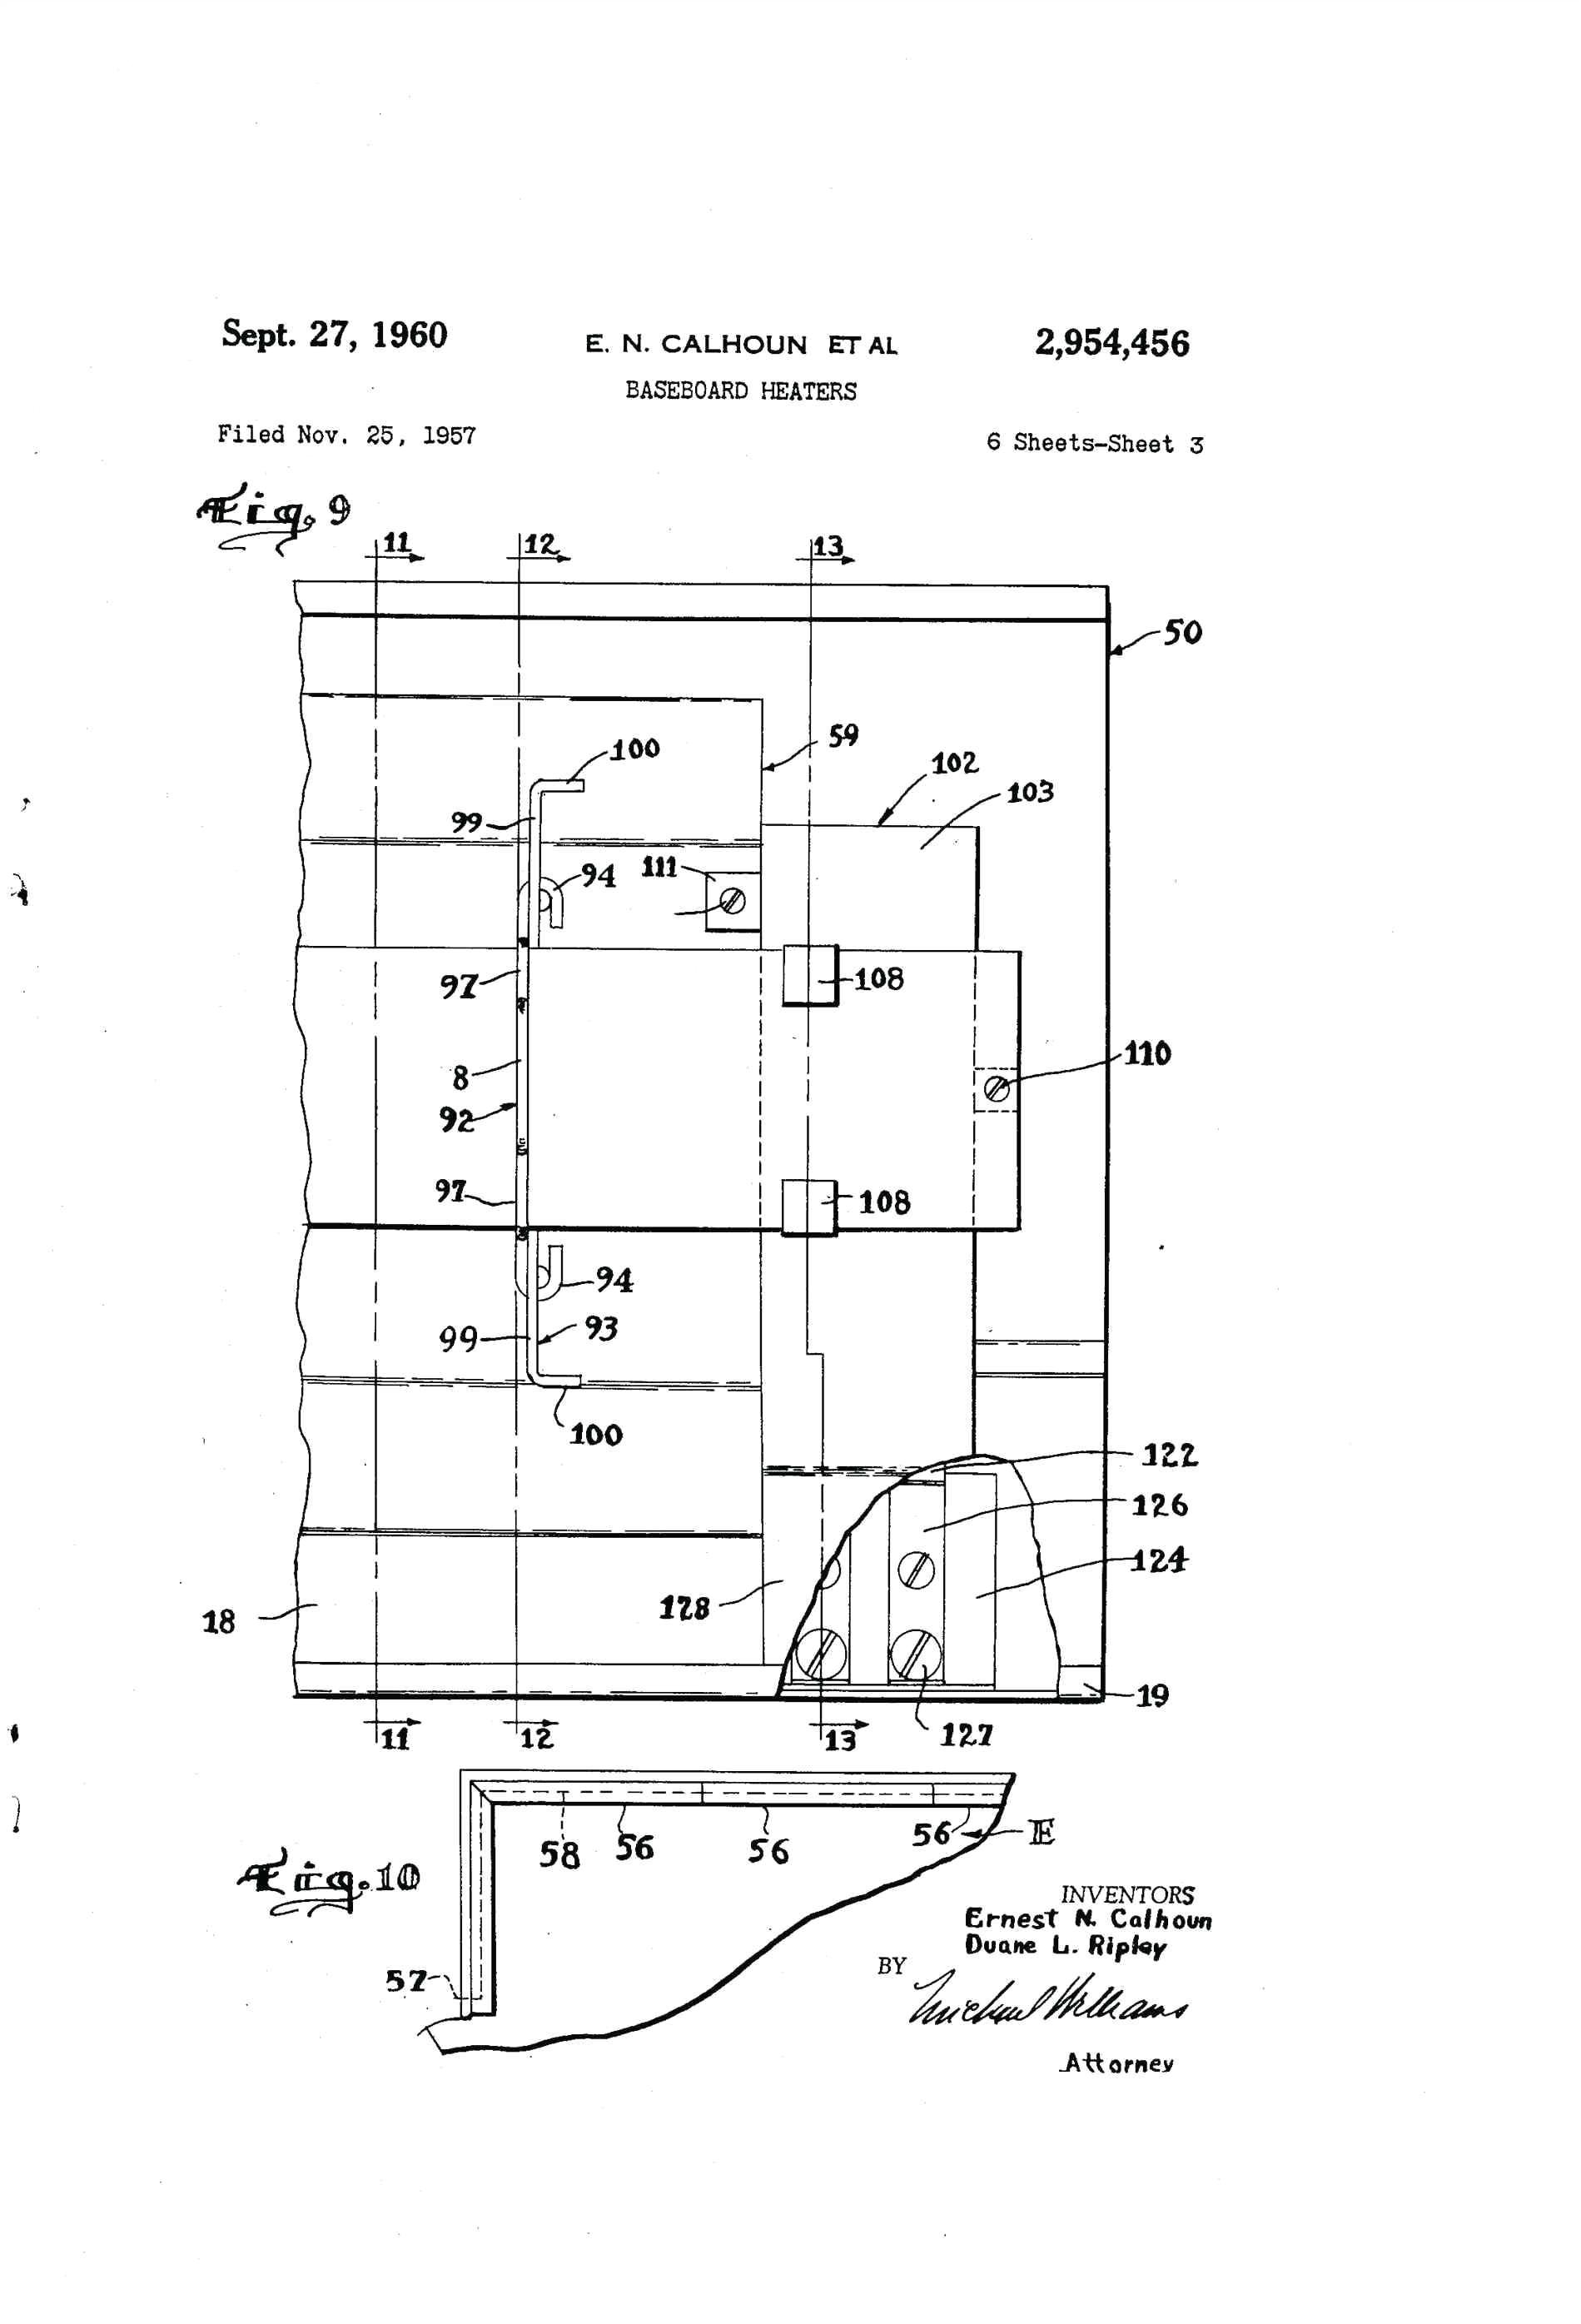 220v Wiring Diagram 220 Electric Heater Wiring Diagram Wiring Diagram